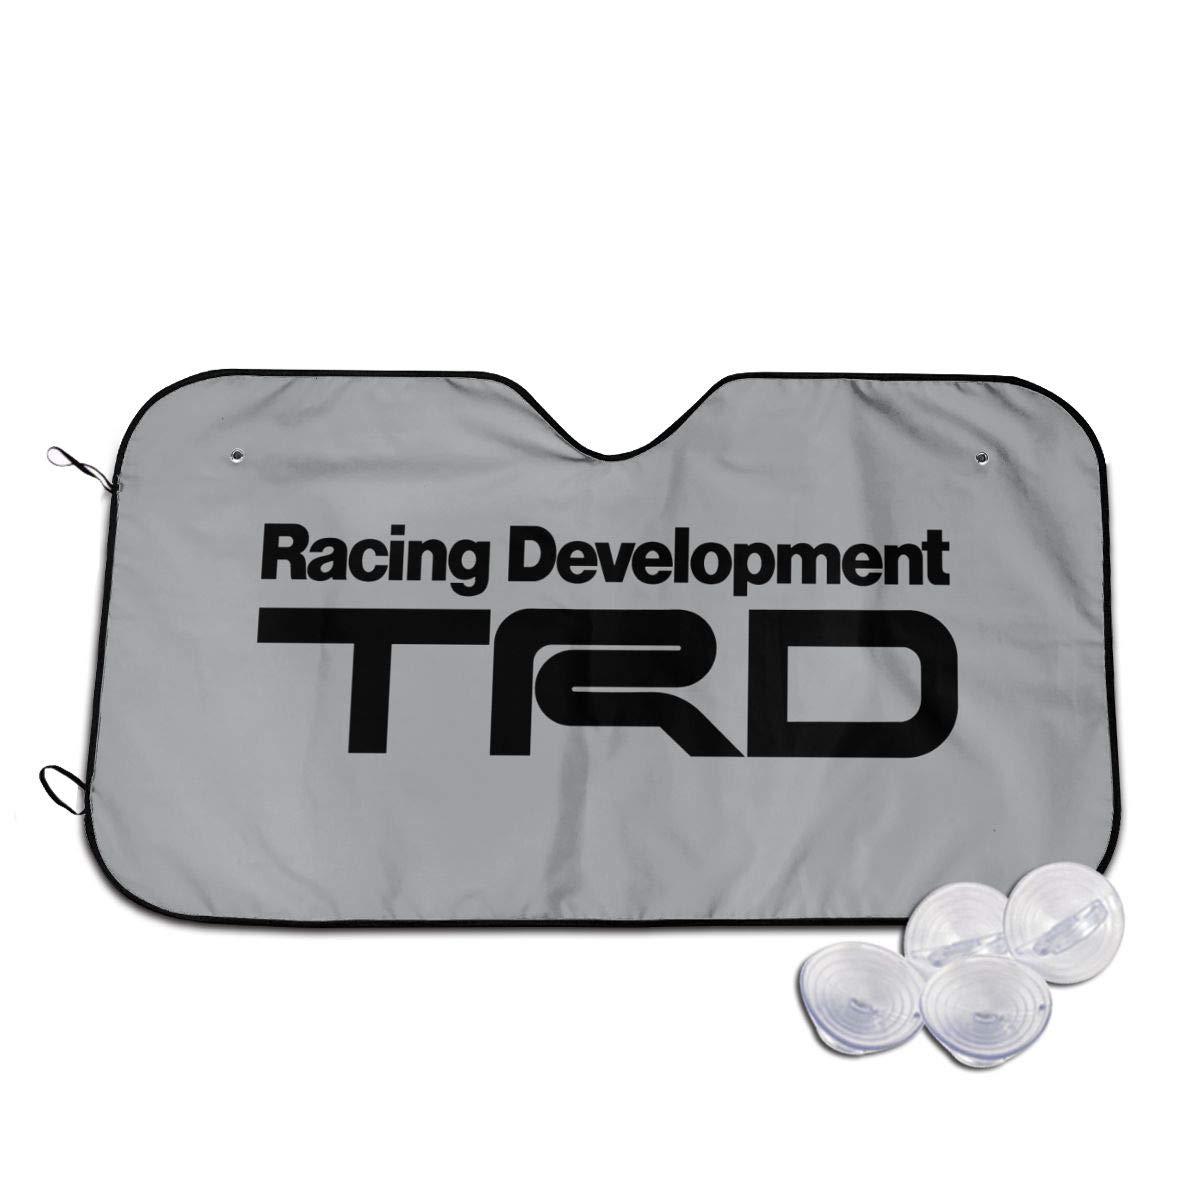 YJMHstore Racing Development TRD Universal Car Sunshades Heat Shield Windshield 2 Sizes